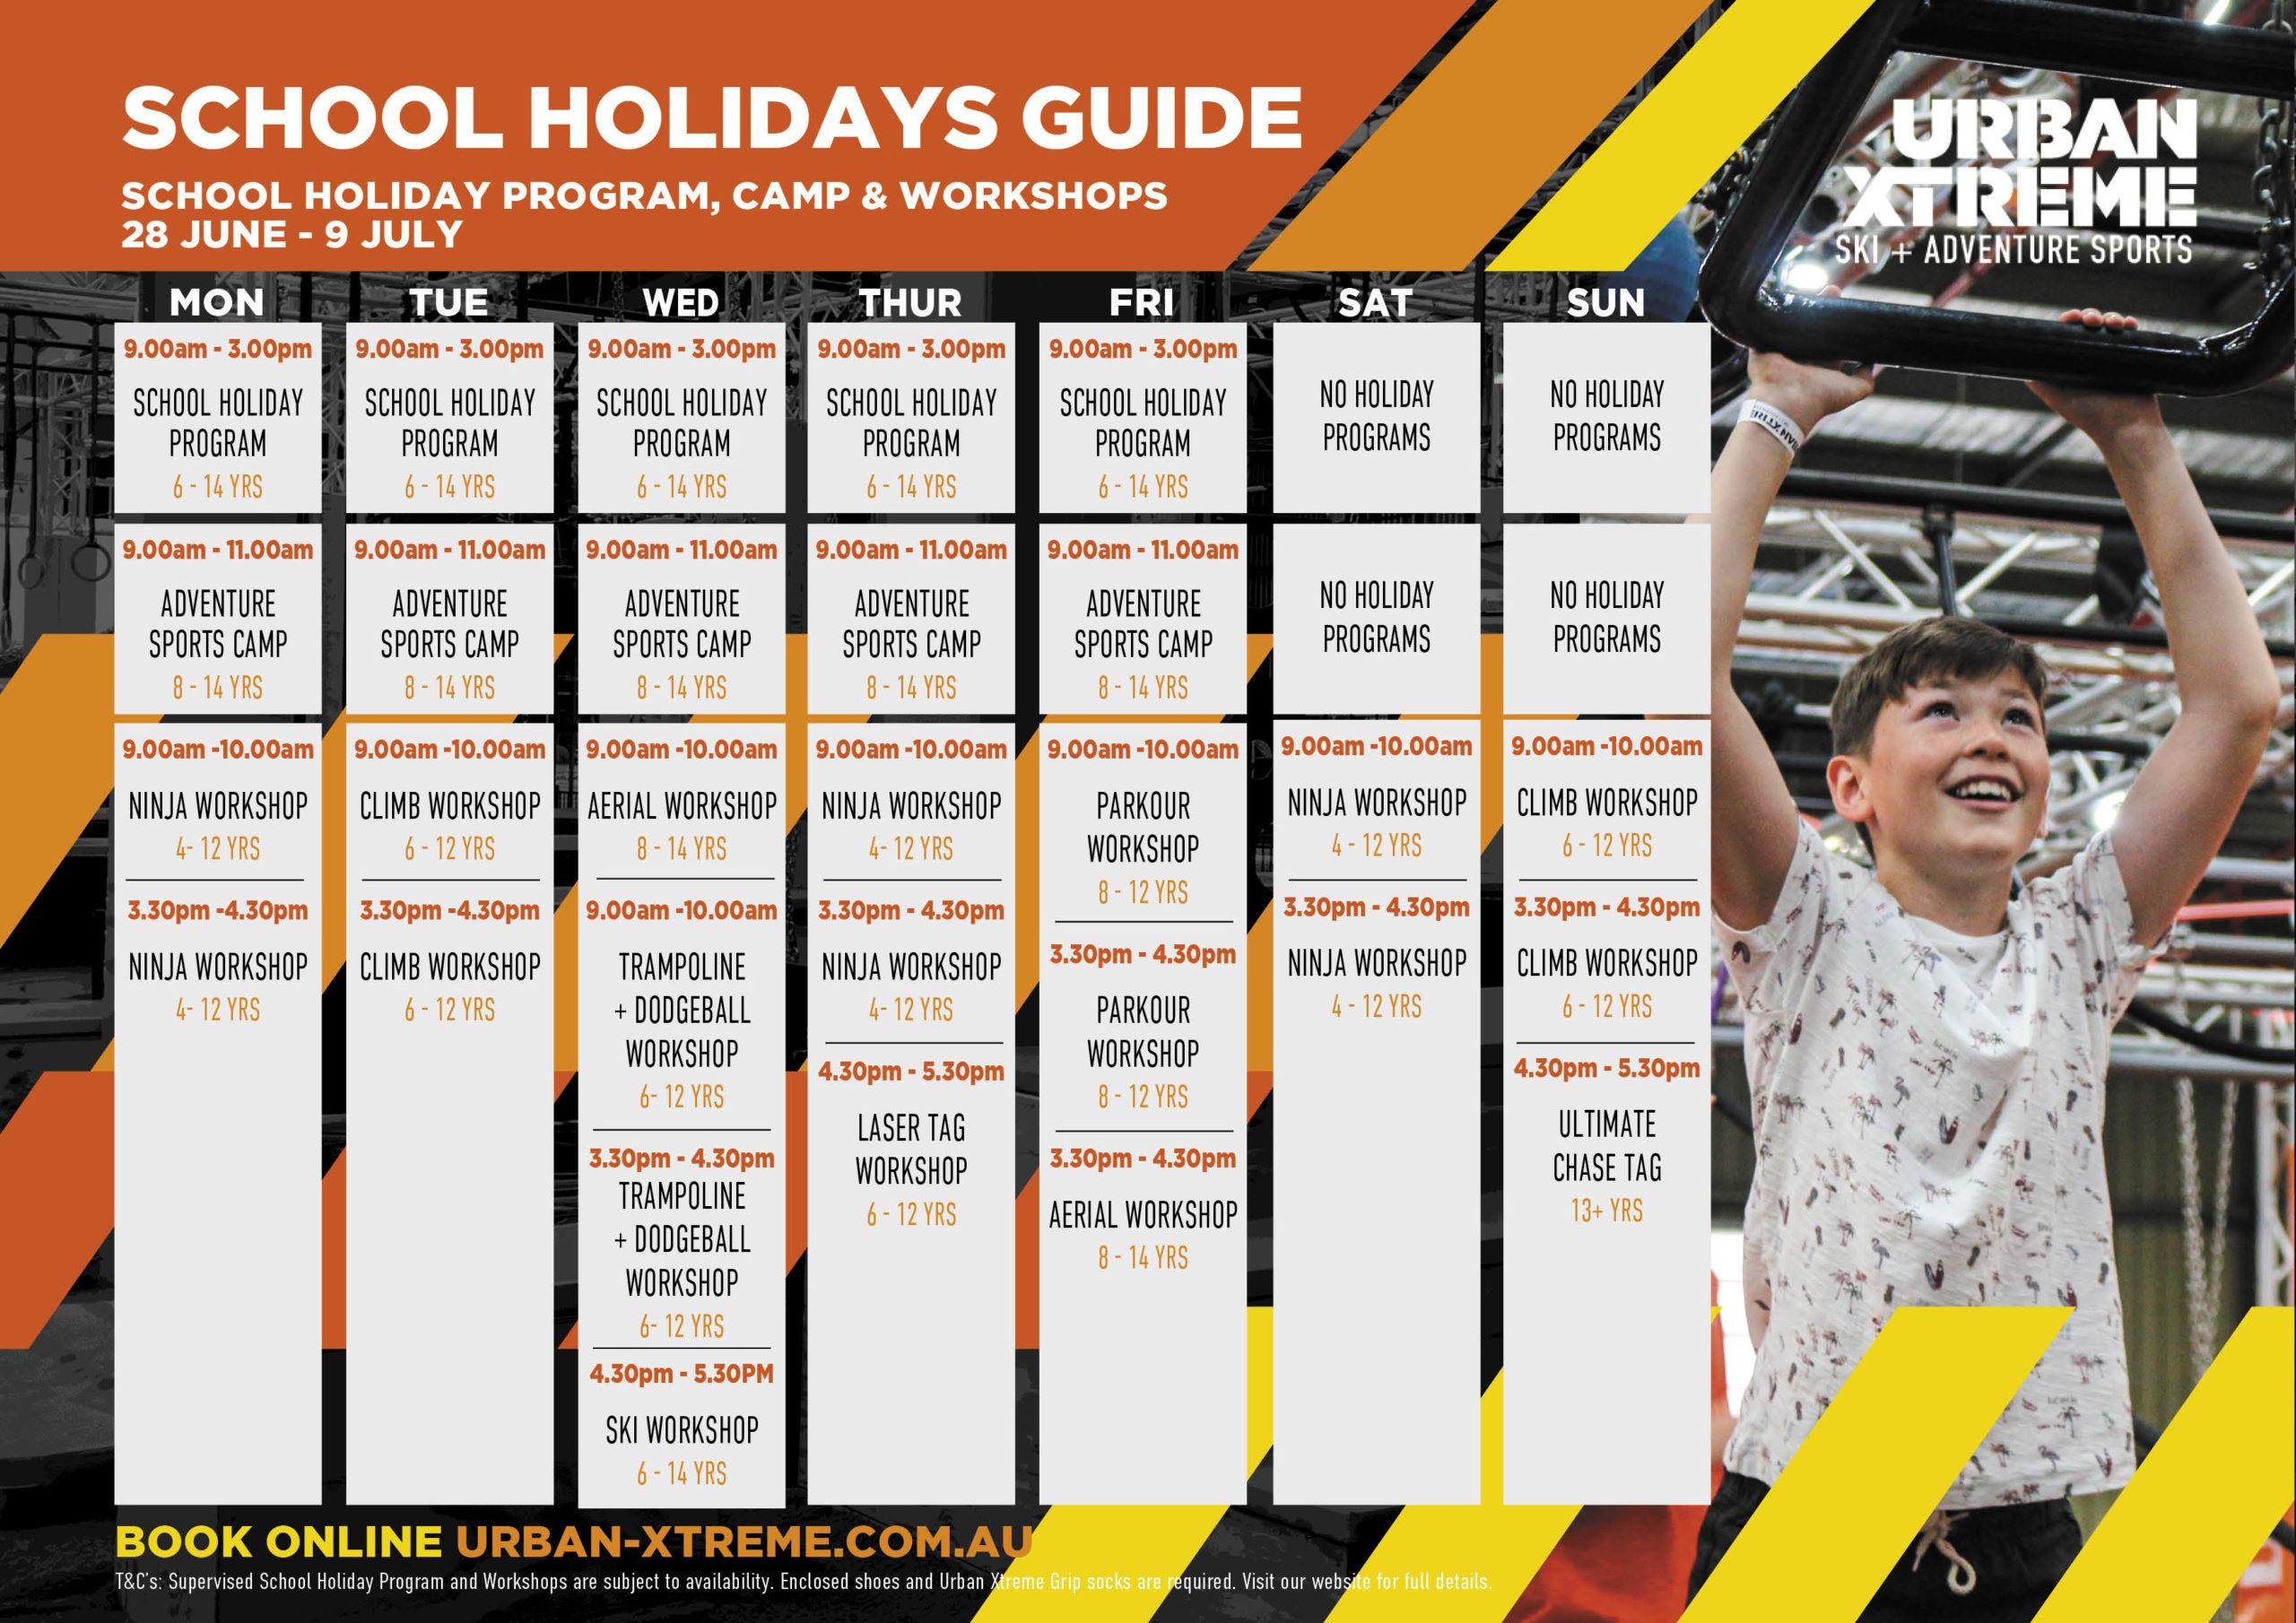 UX School Holiday Workshops